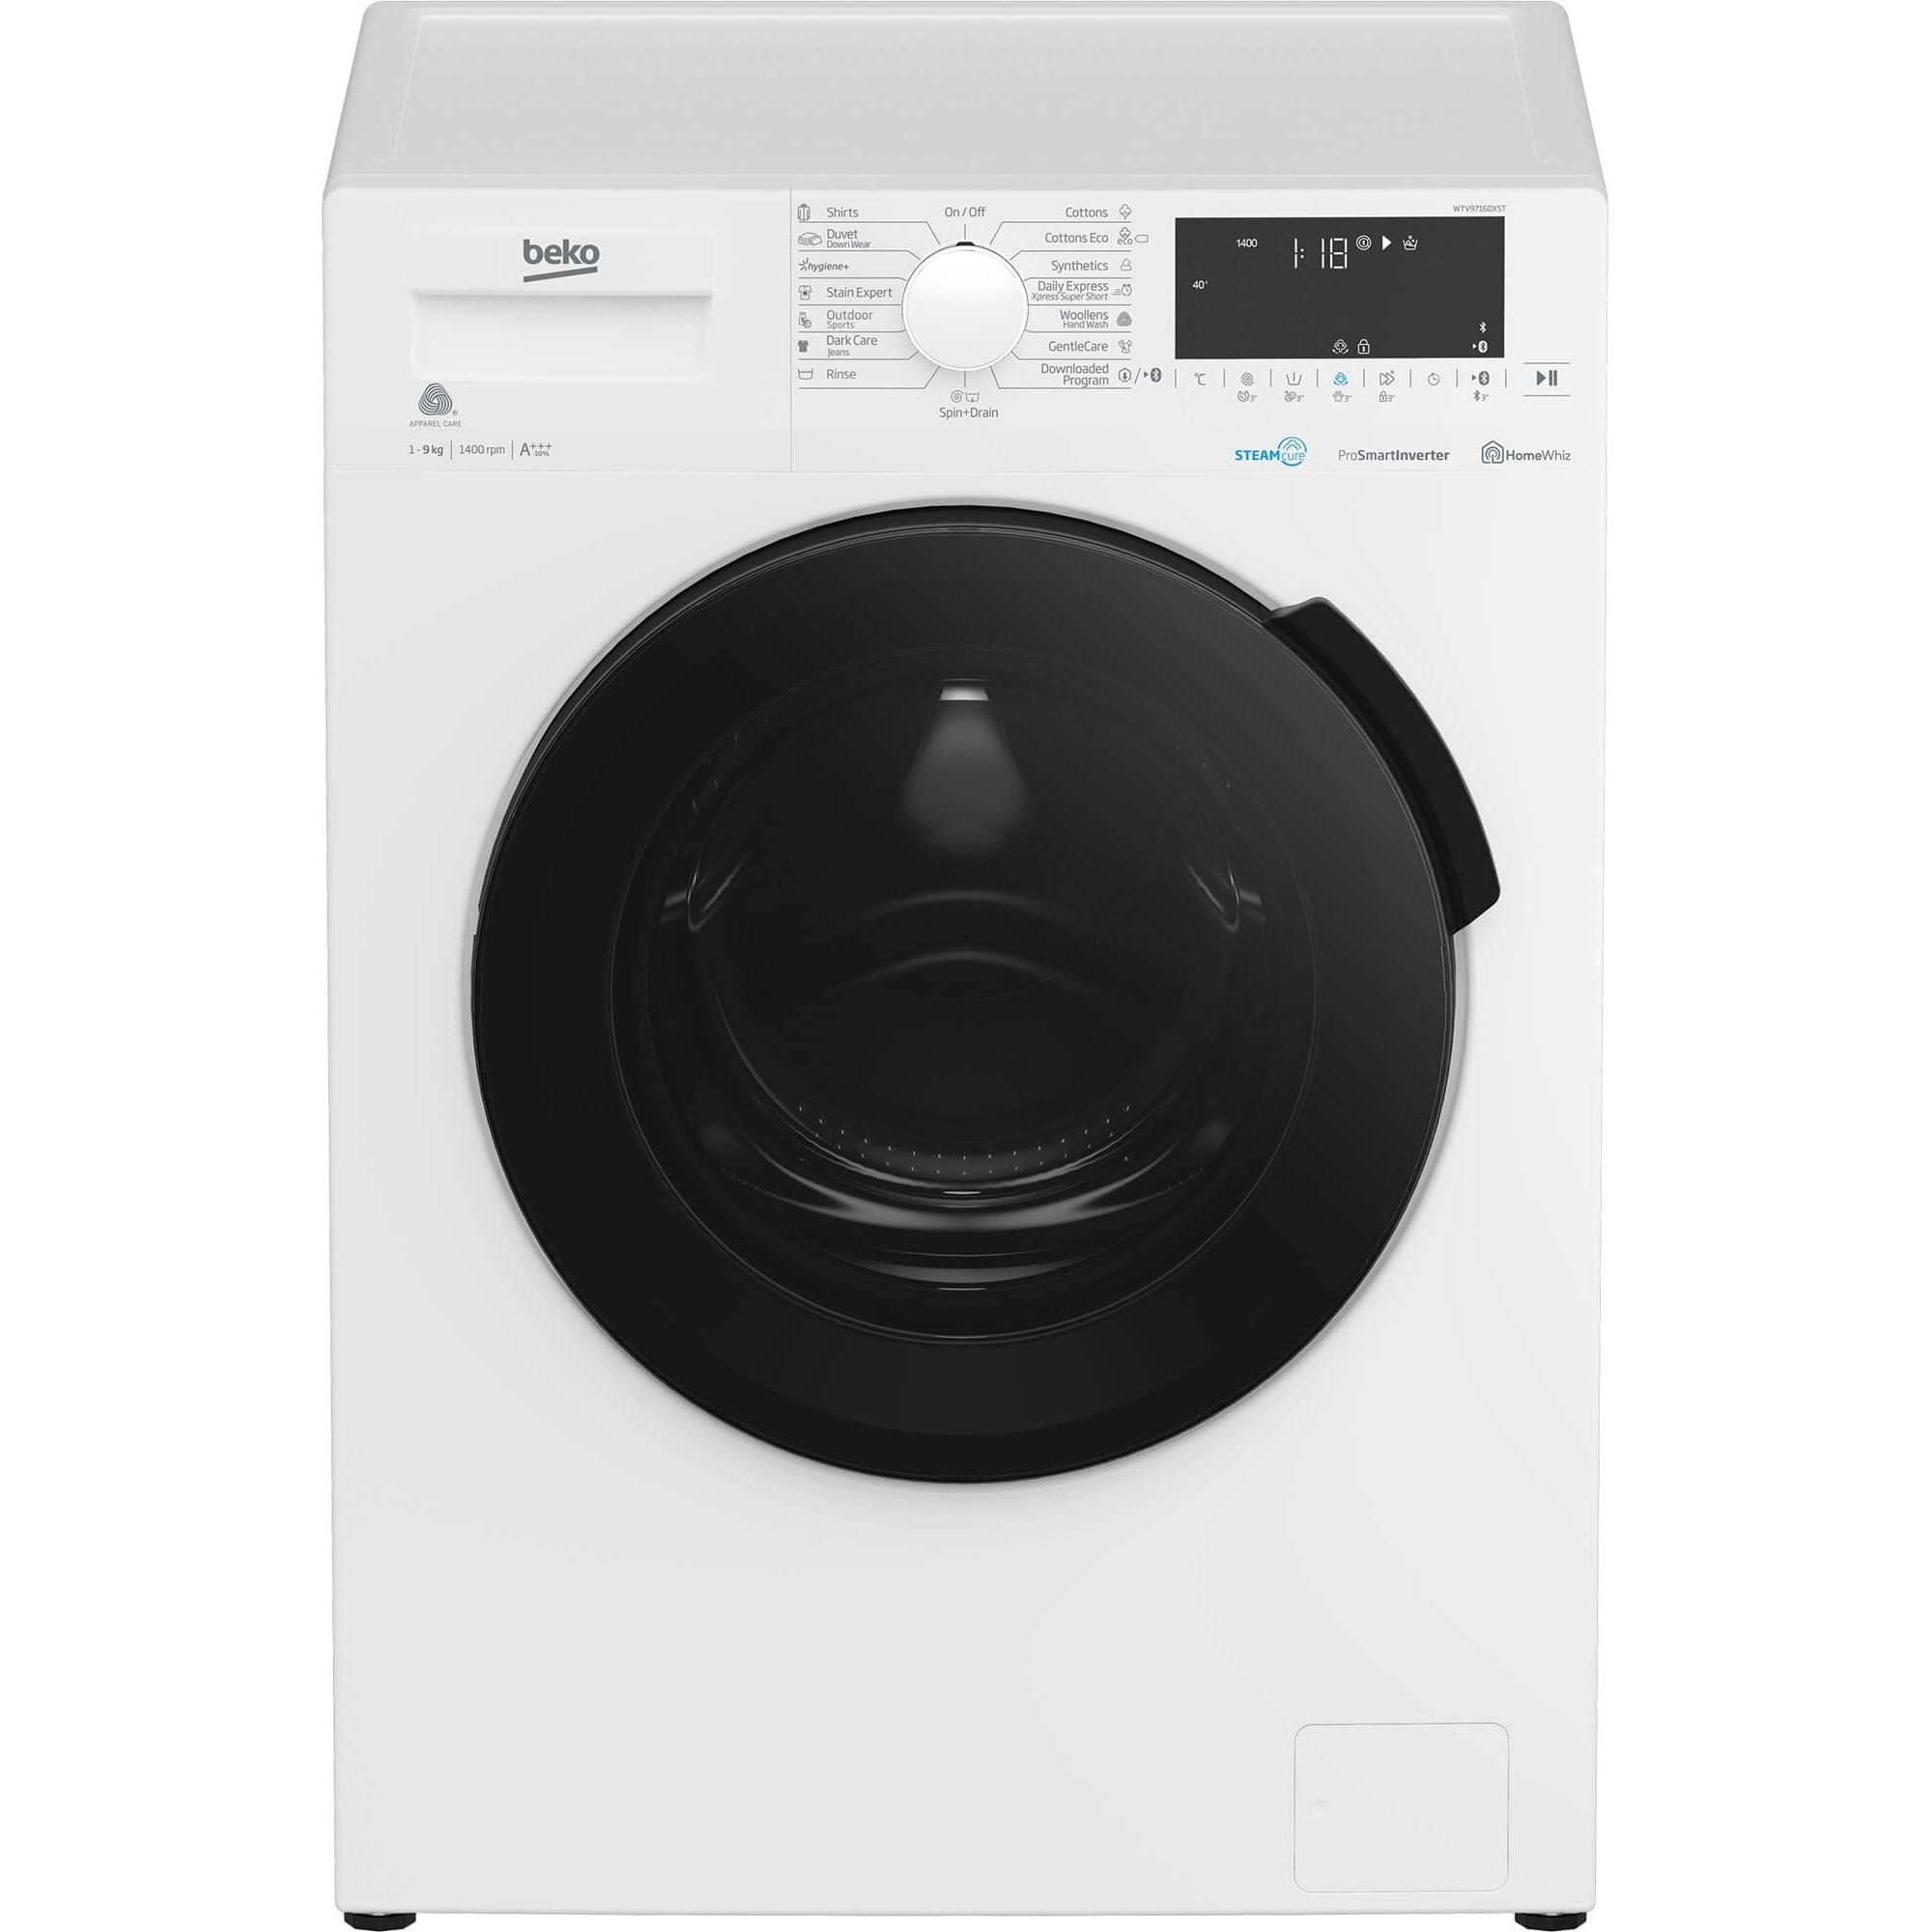 Fotografie Masina de spalat rufe Beko WTV9716DXST, 9 kg, 1400 RPM, Clasa A+++, HomeWhiz, conectare Bluetooth, SteamCure, AddGarment, Motor ProSmart Inverter, Alb